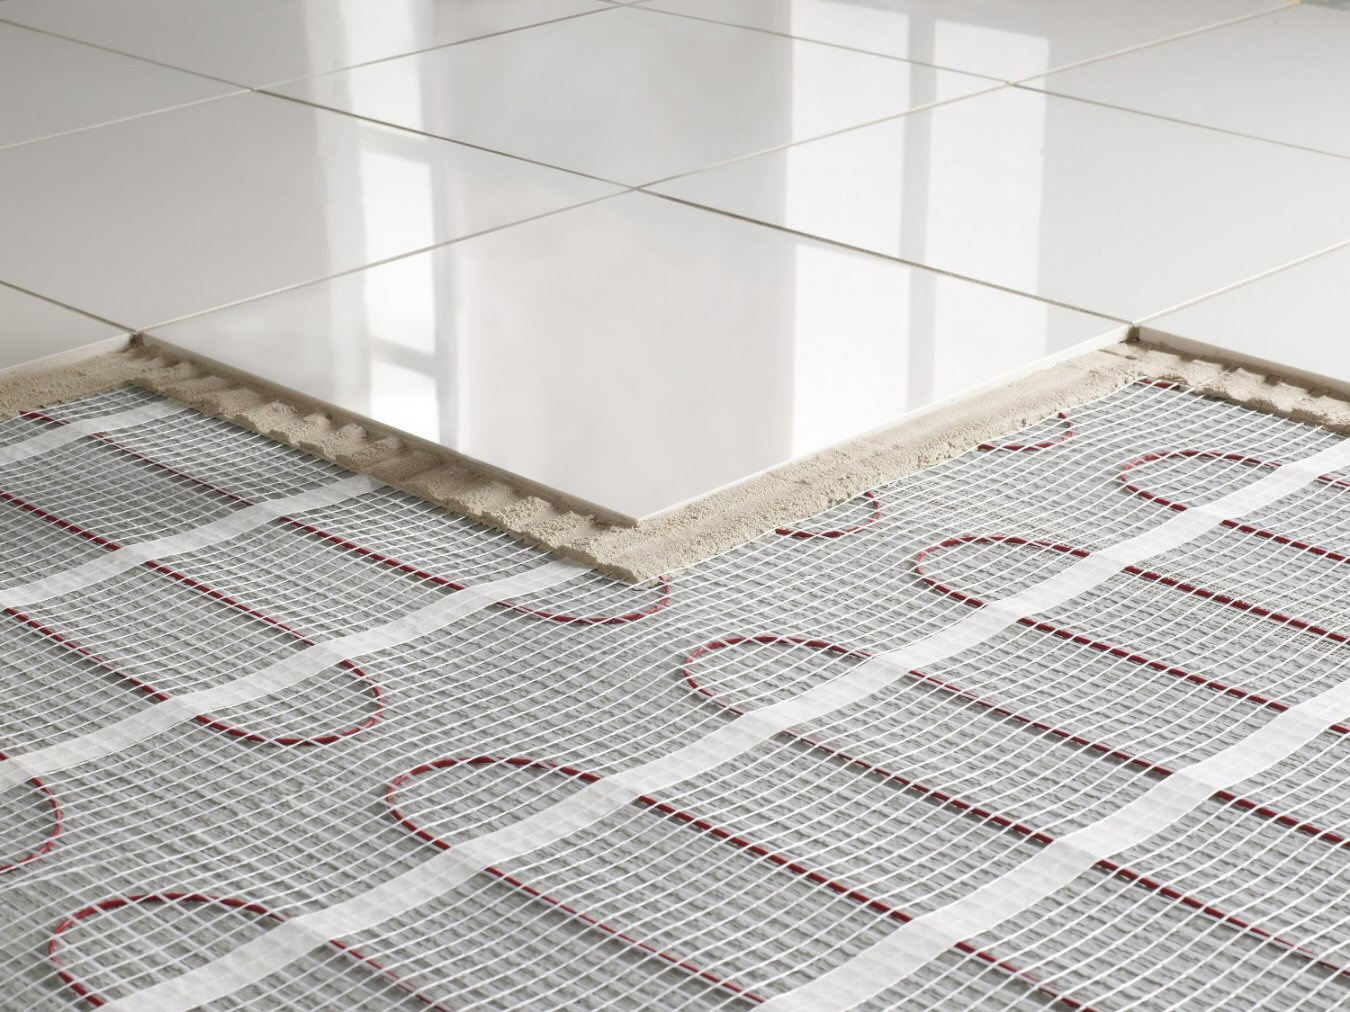 Be smart with your heating - underfloor heating